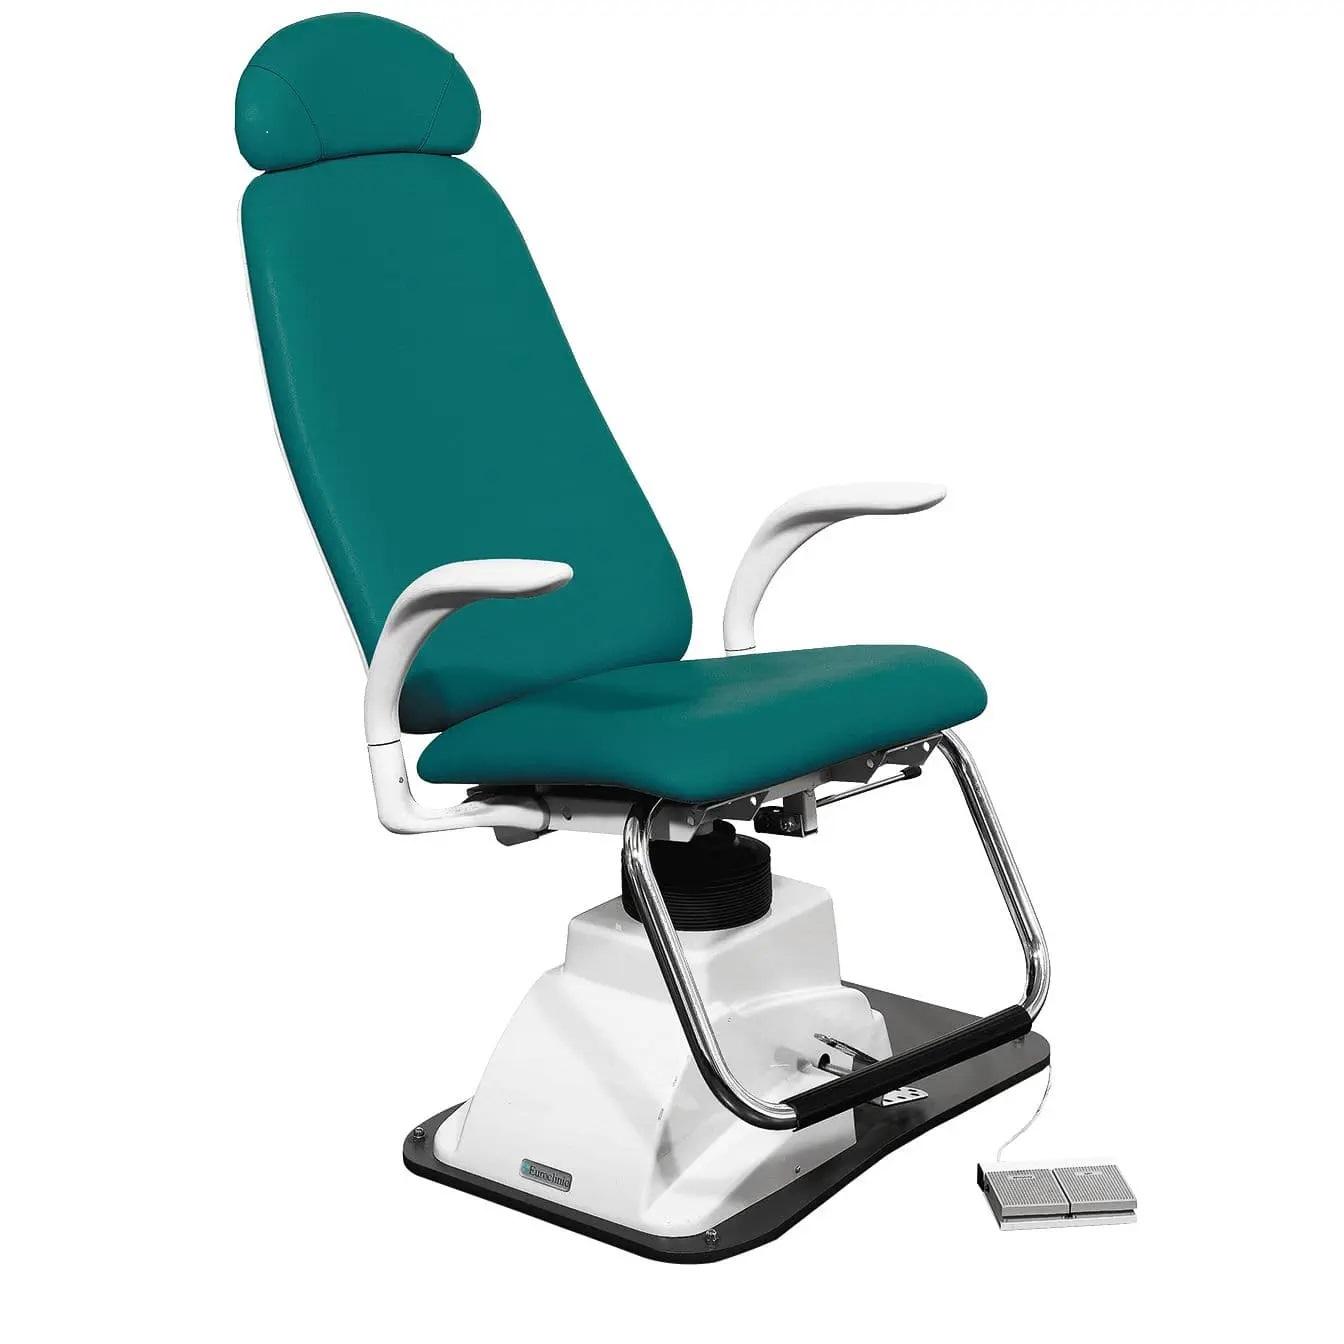 orl stolica nova slika